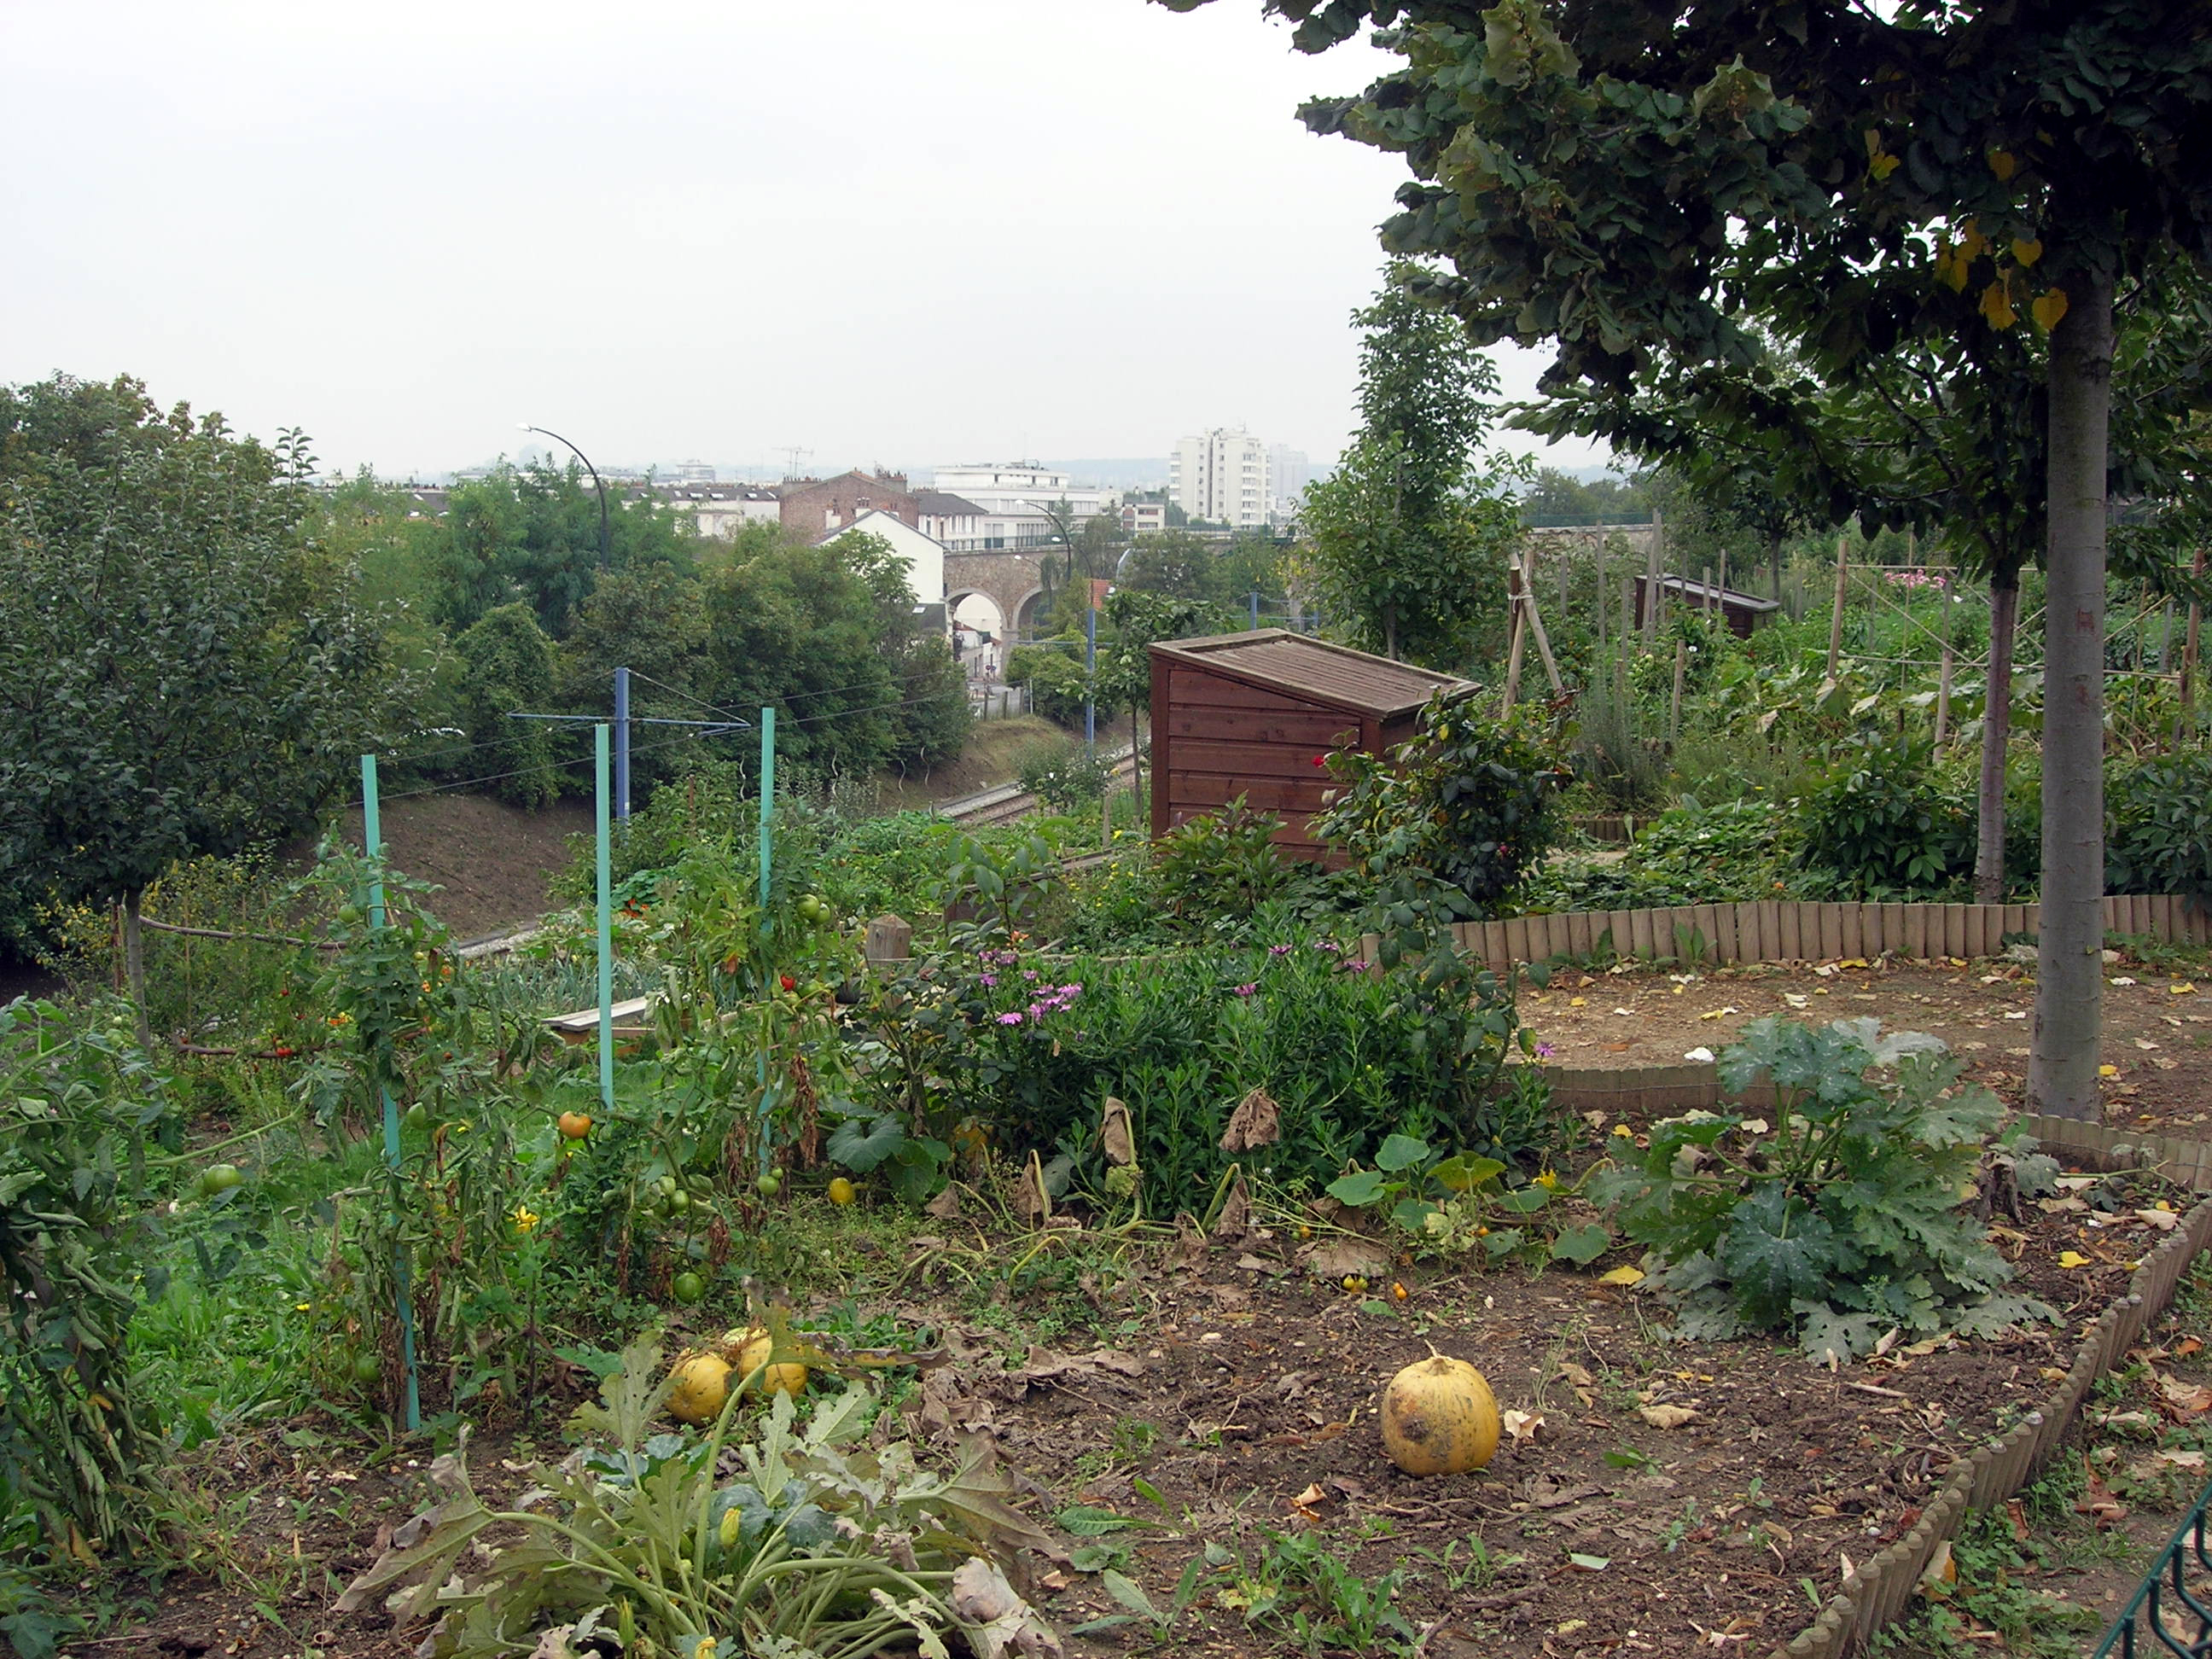 Jardin porte de cloud meilleures 28 images jardin for Housse de couette wikipedia